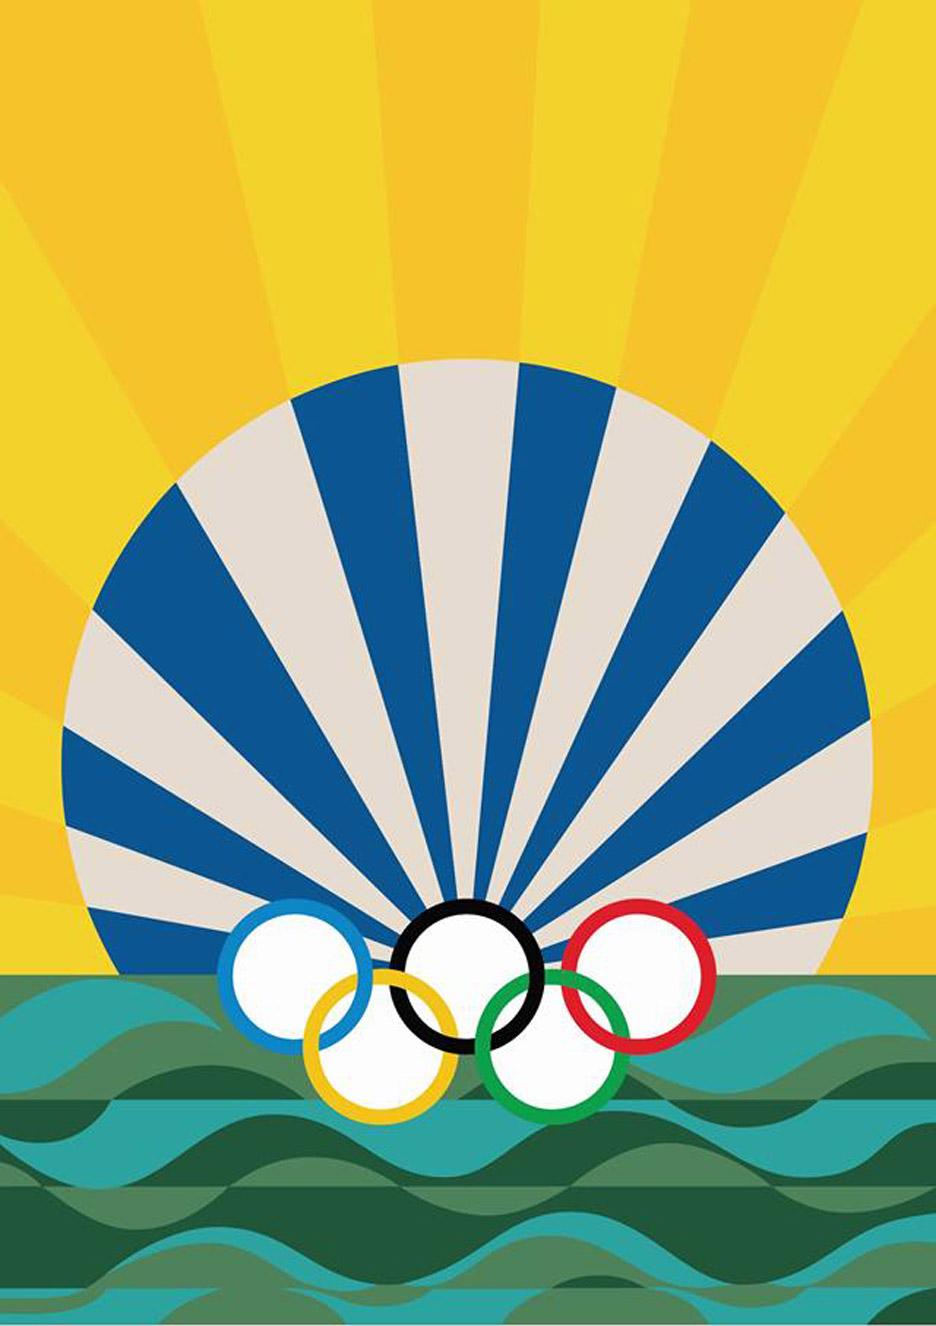 rio_olympics_2016_posters_artists_dezeen_936_4